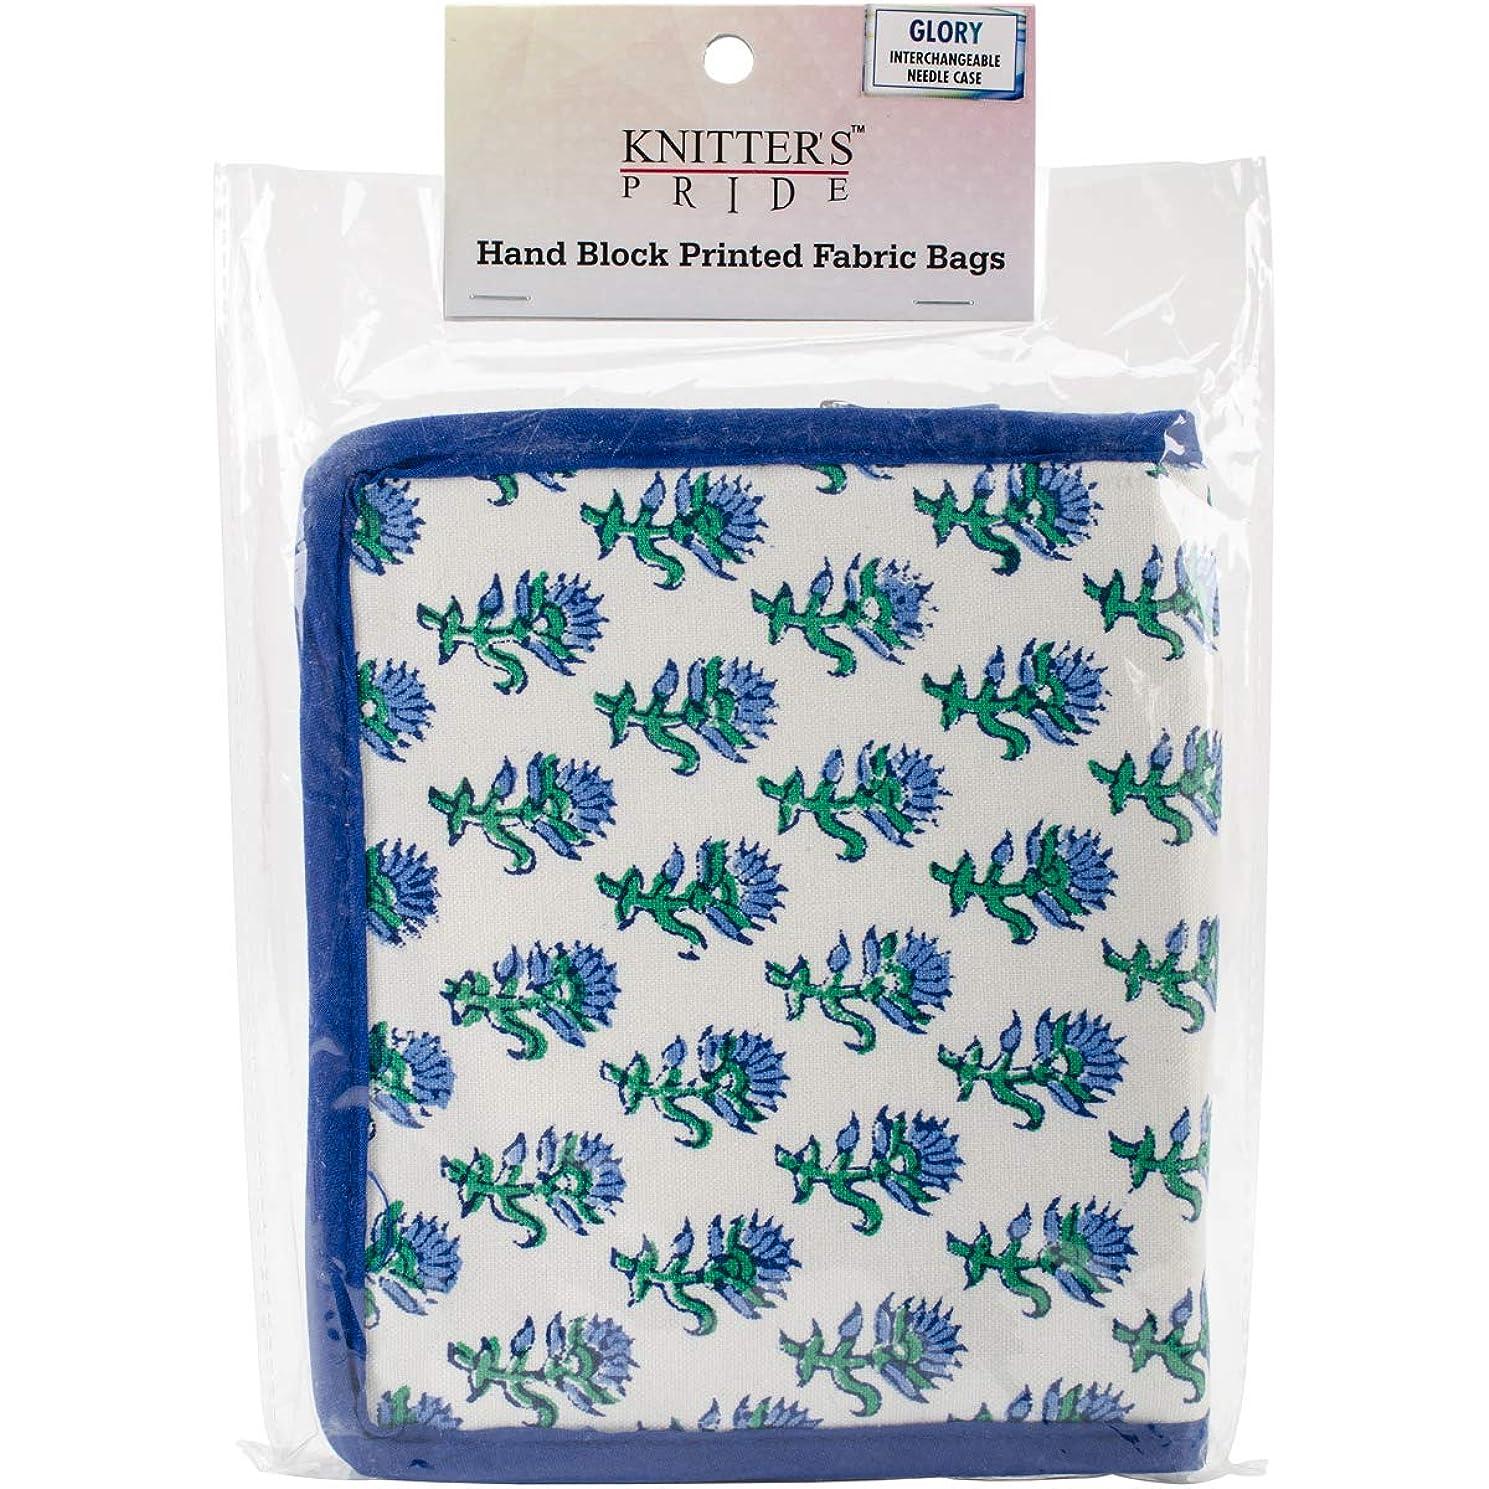 Knitter's Pride 810021 Glory Interchangeable Needle Case